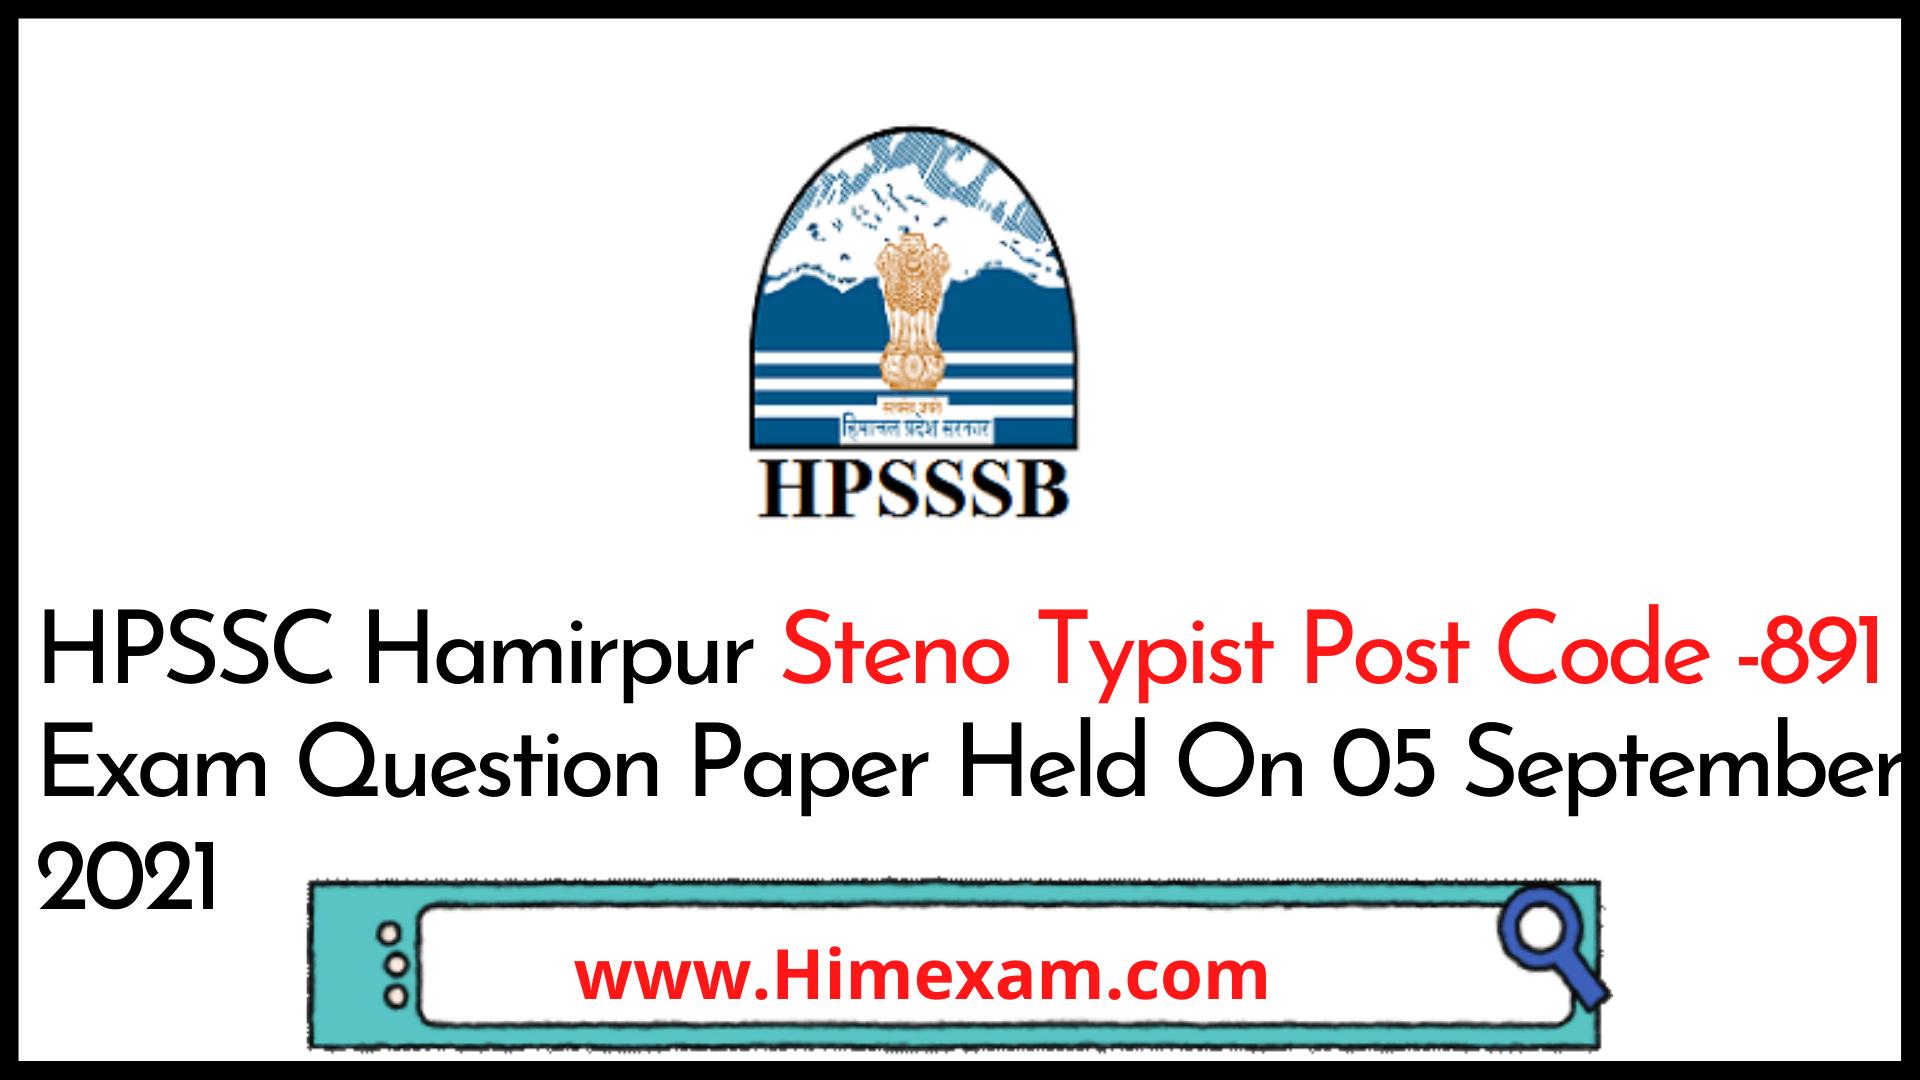 HPSSC Hamirpur Steno Typist  Post Code -891 Exam Question Paper Held On 05 September 2021